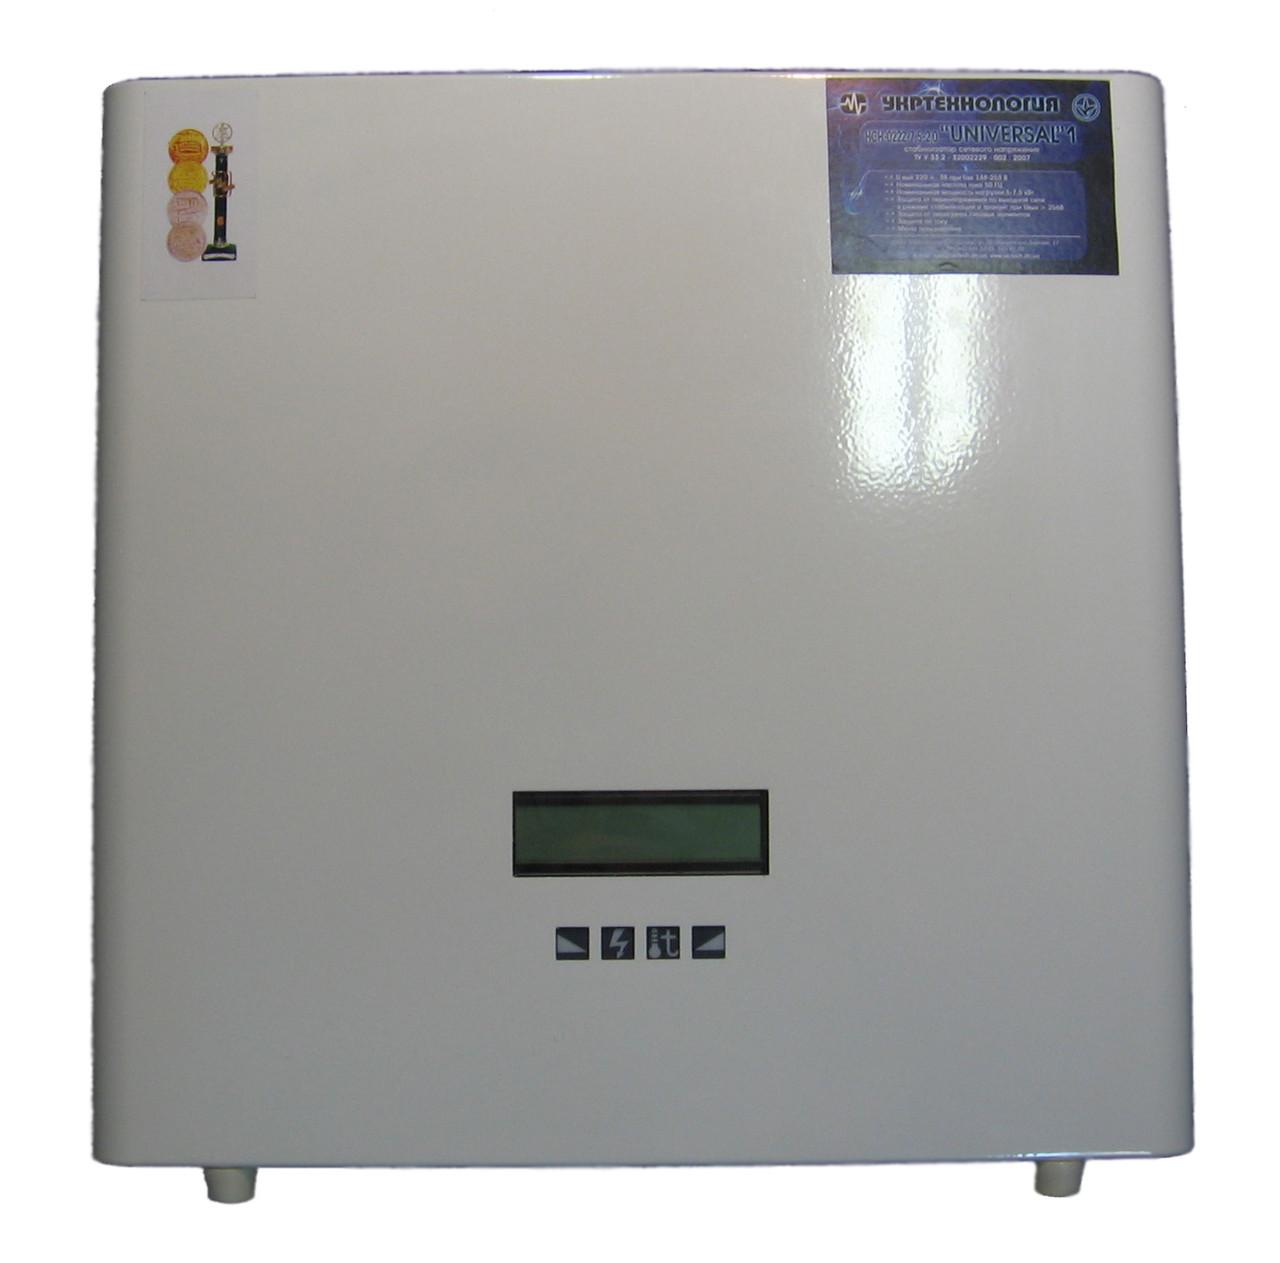 Стабилизатор напряжения НСН Universal 7500 HV (7,5 кВт)